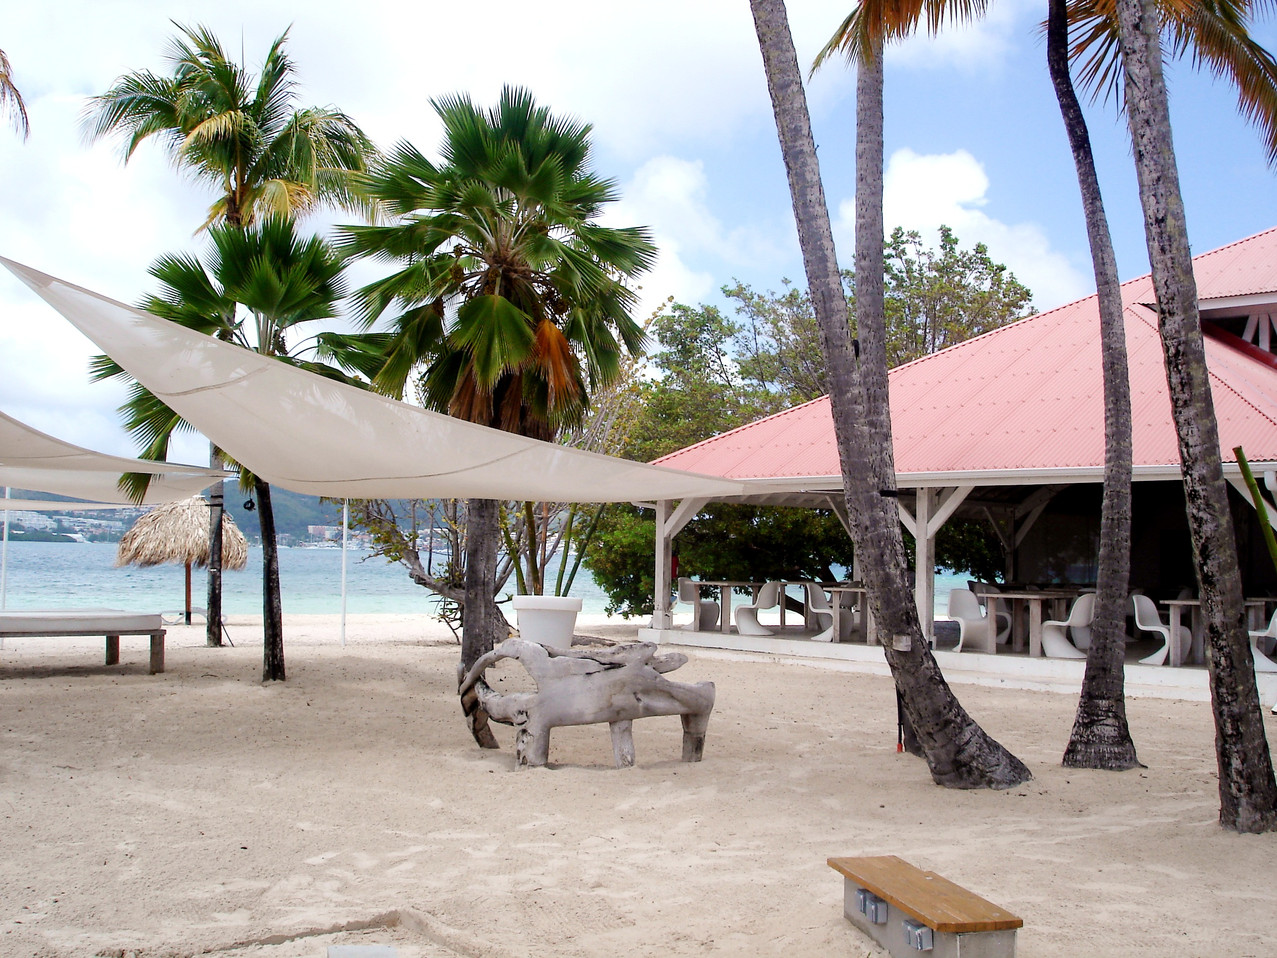 Club Med Martinique Les boucaniers